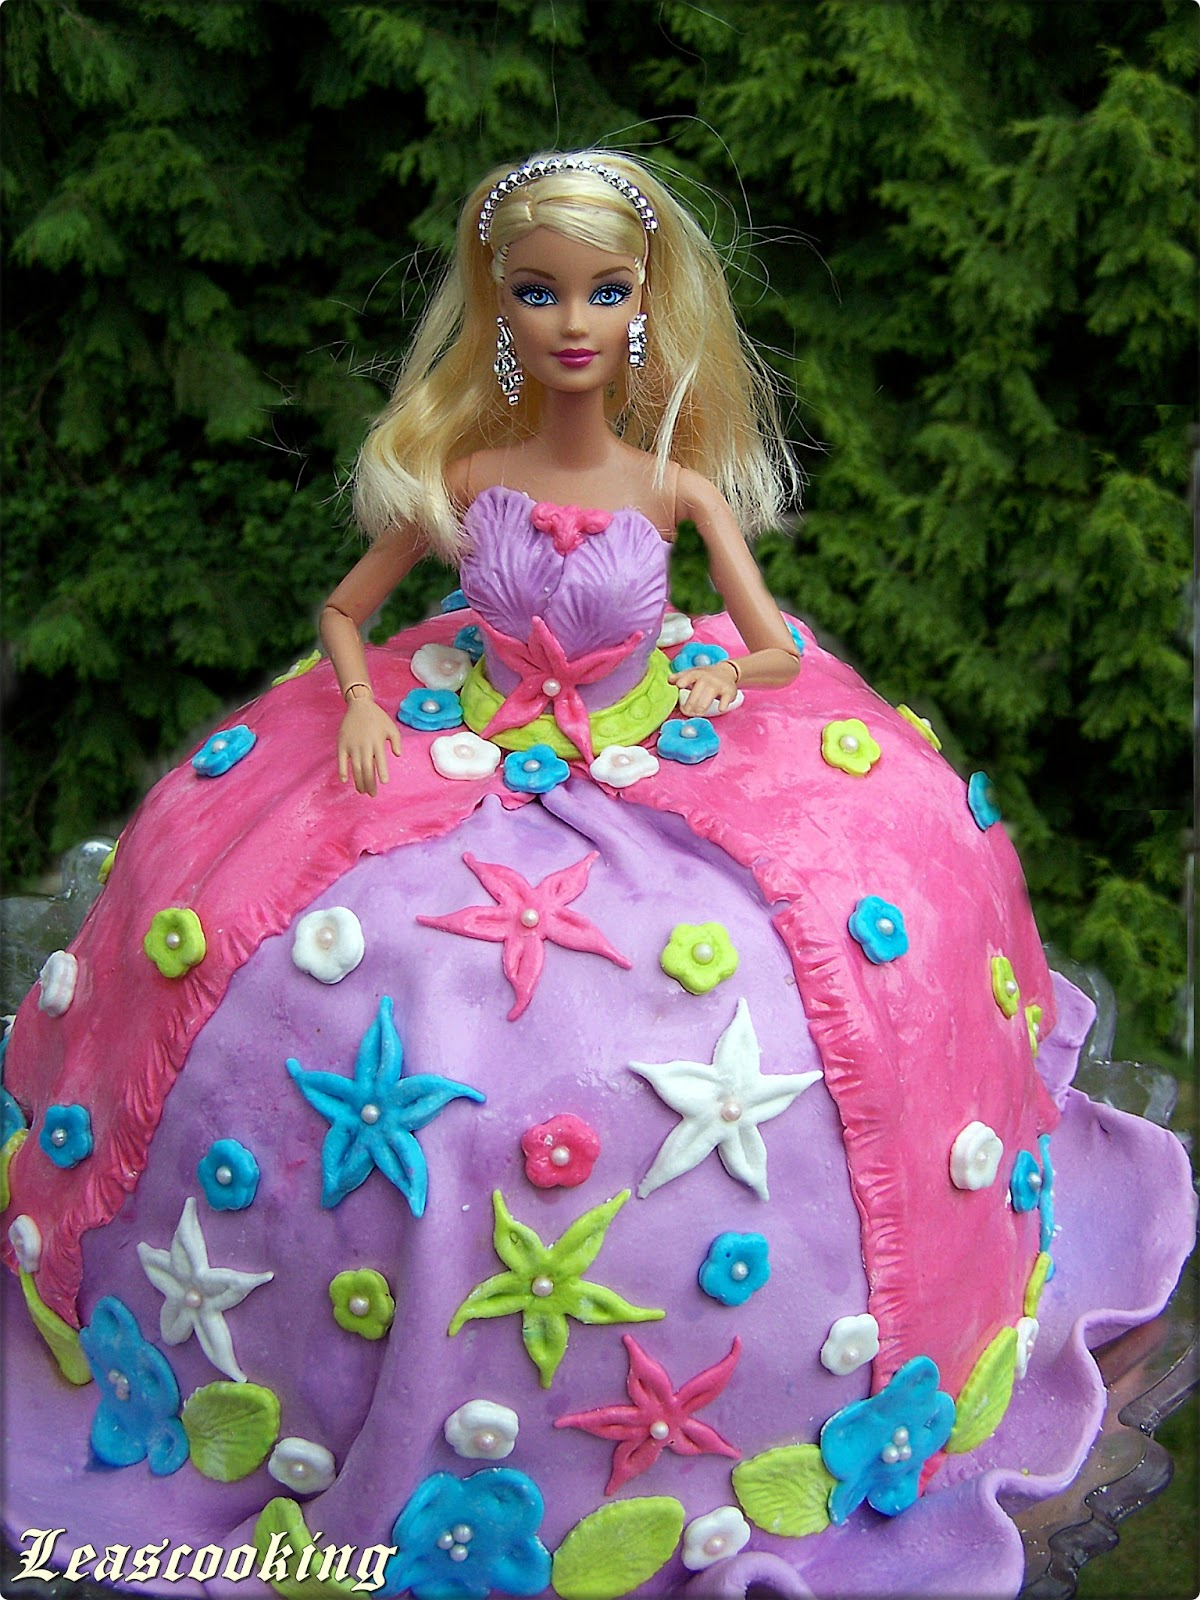 Lea 39 s cooking princess barbi cake - Barbi princesse ...